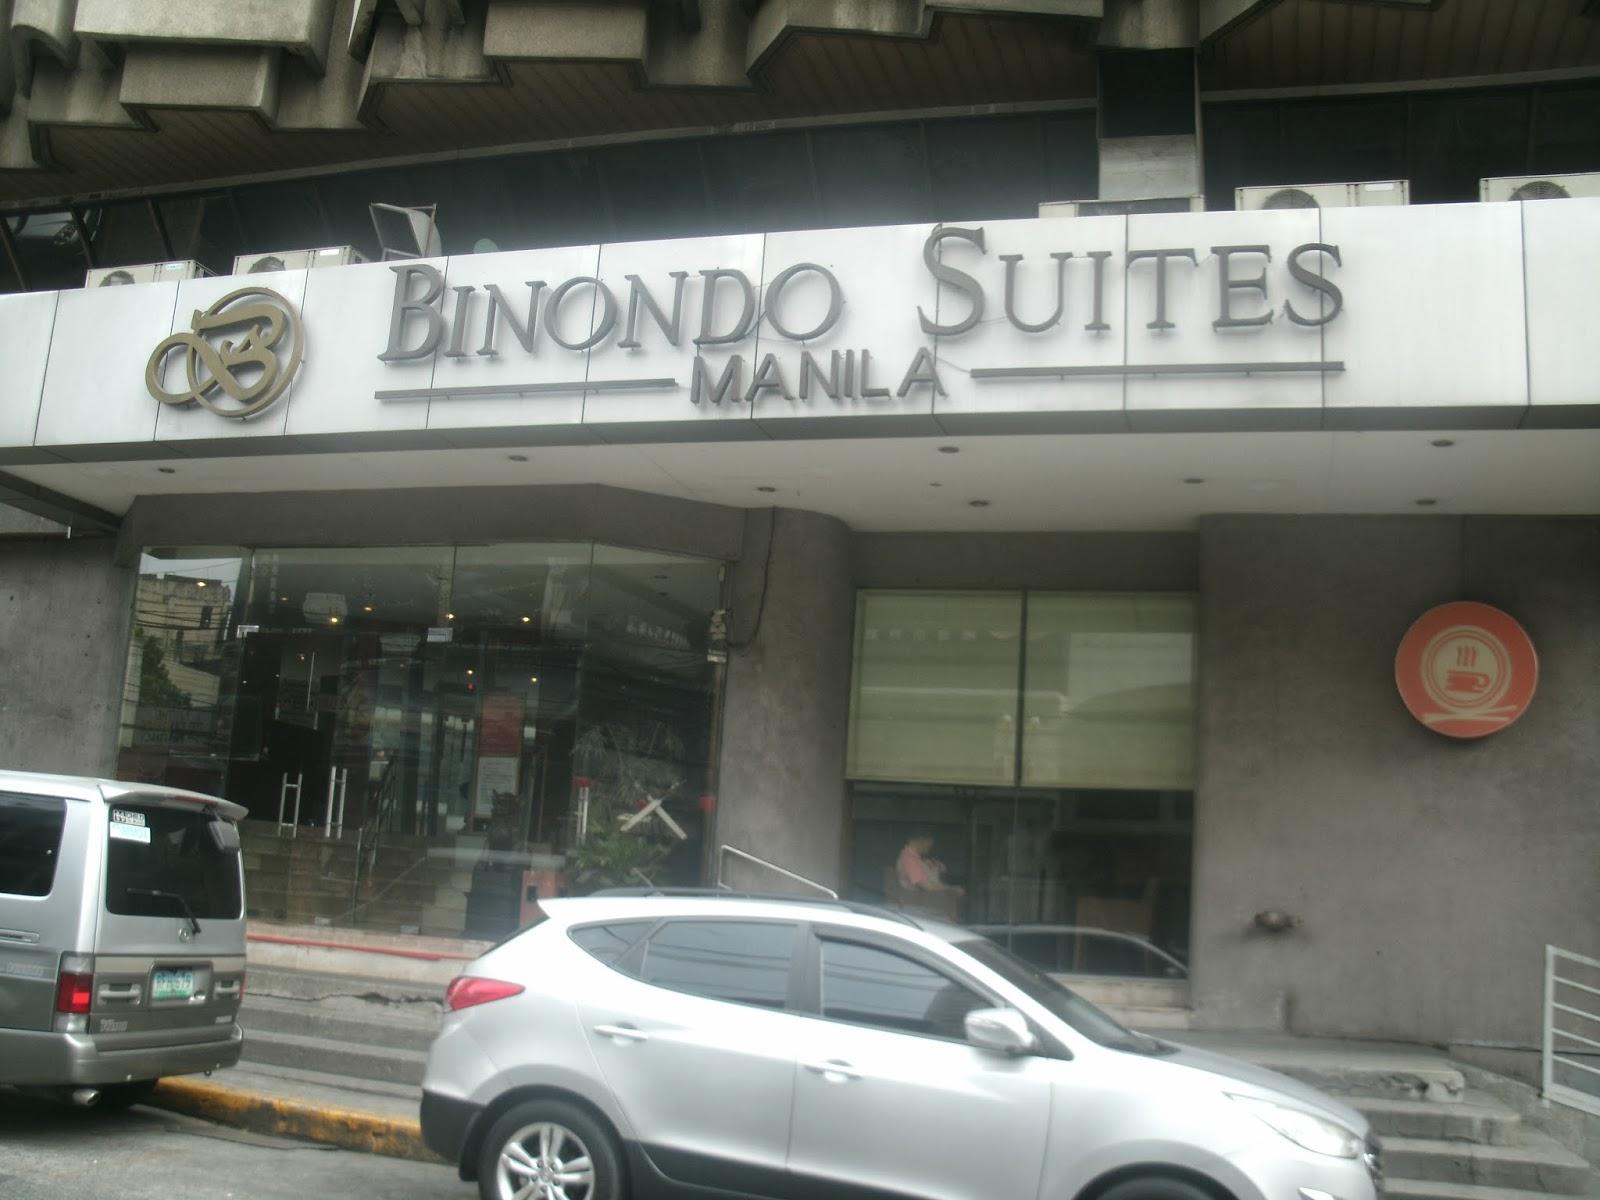 Binondo Suites